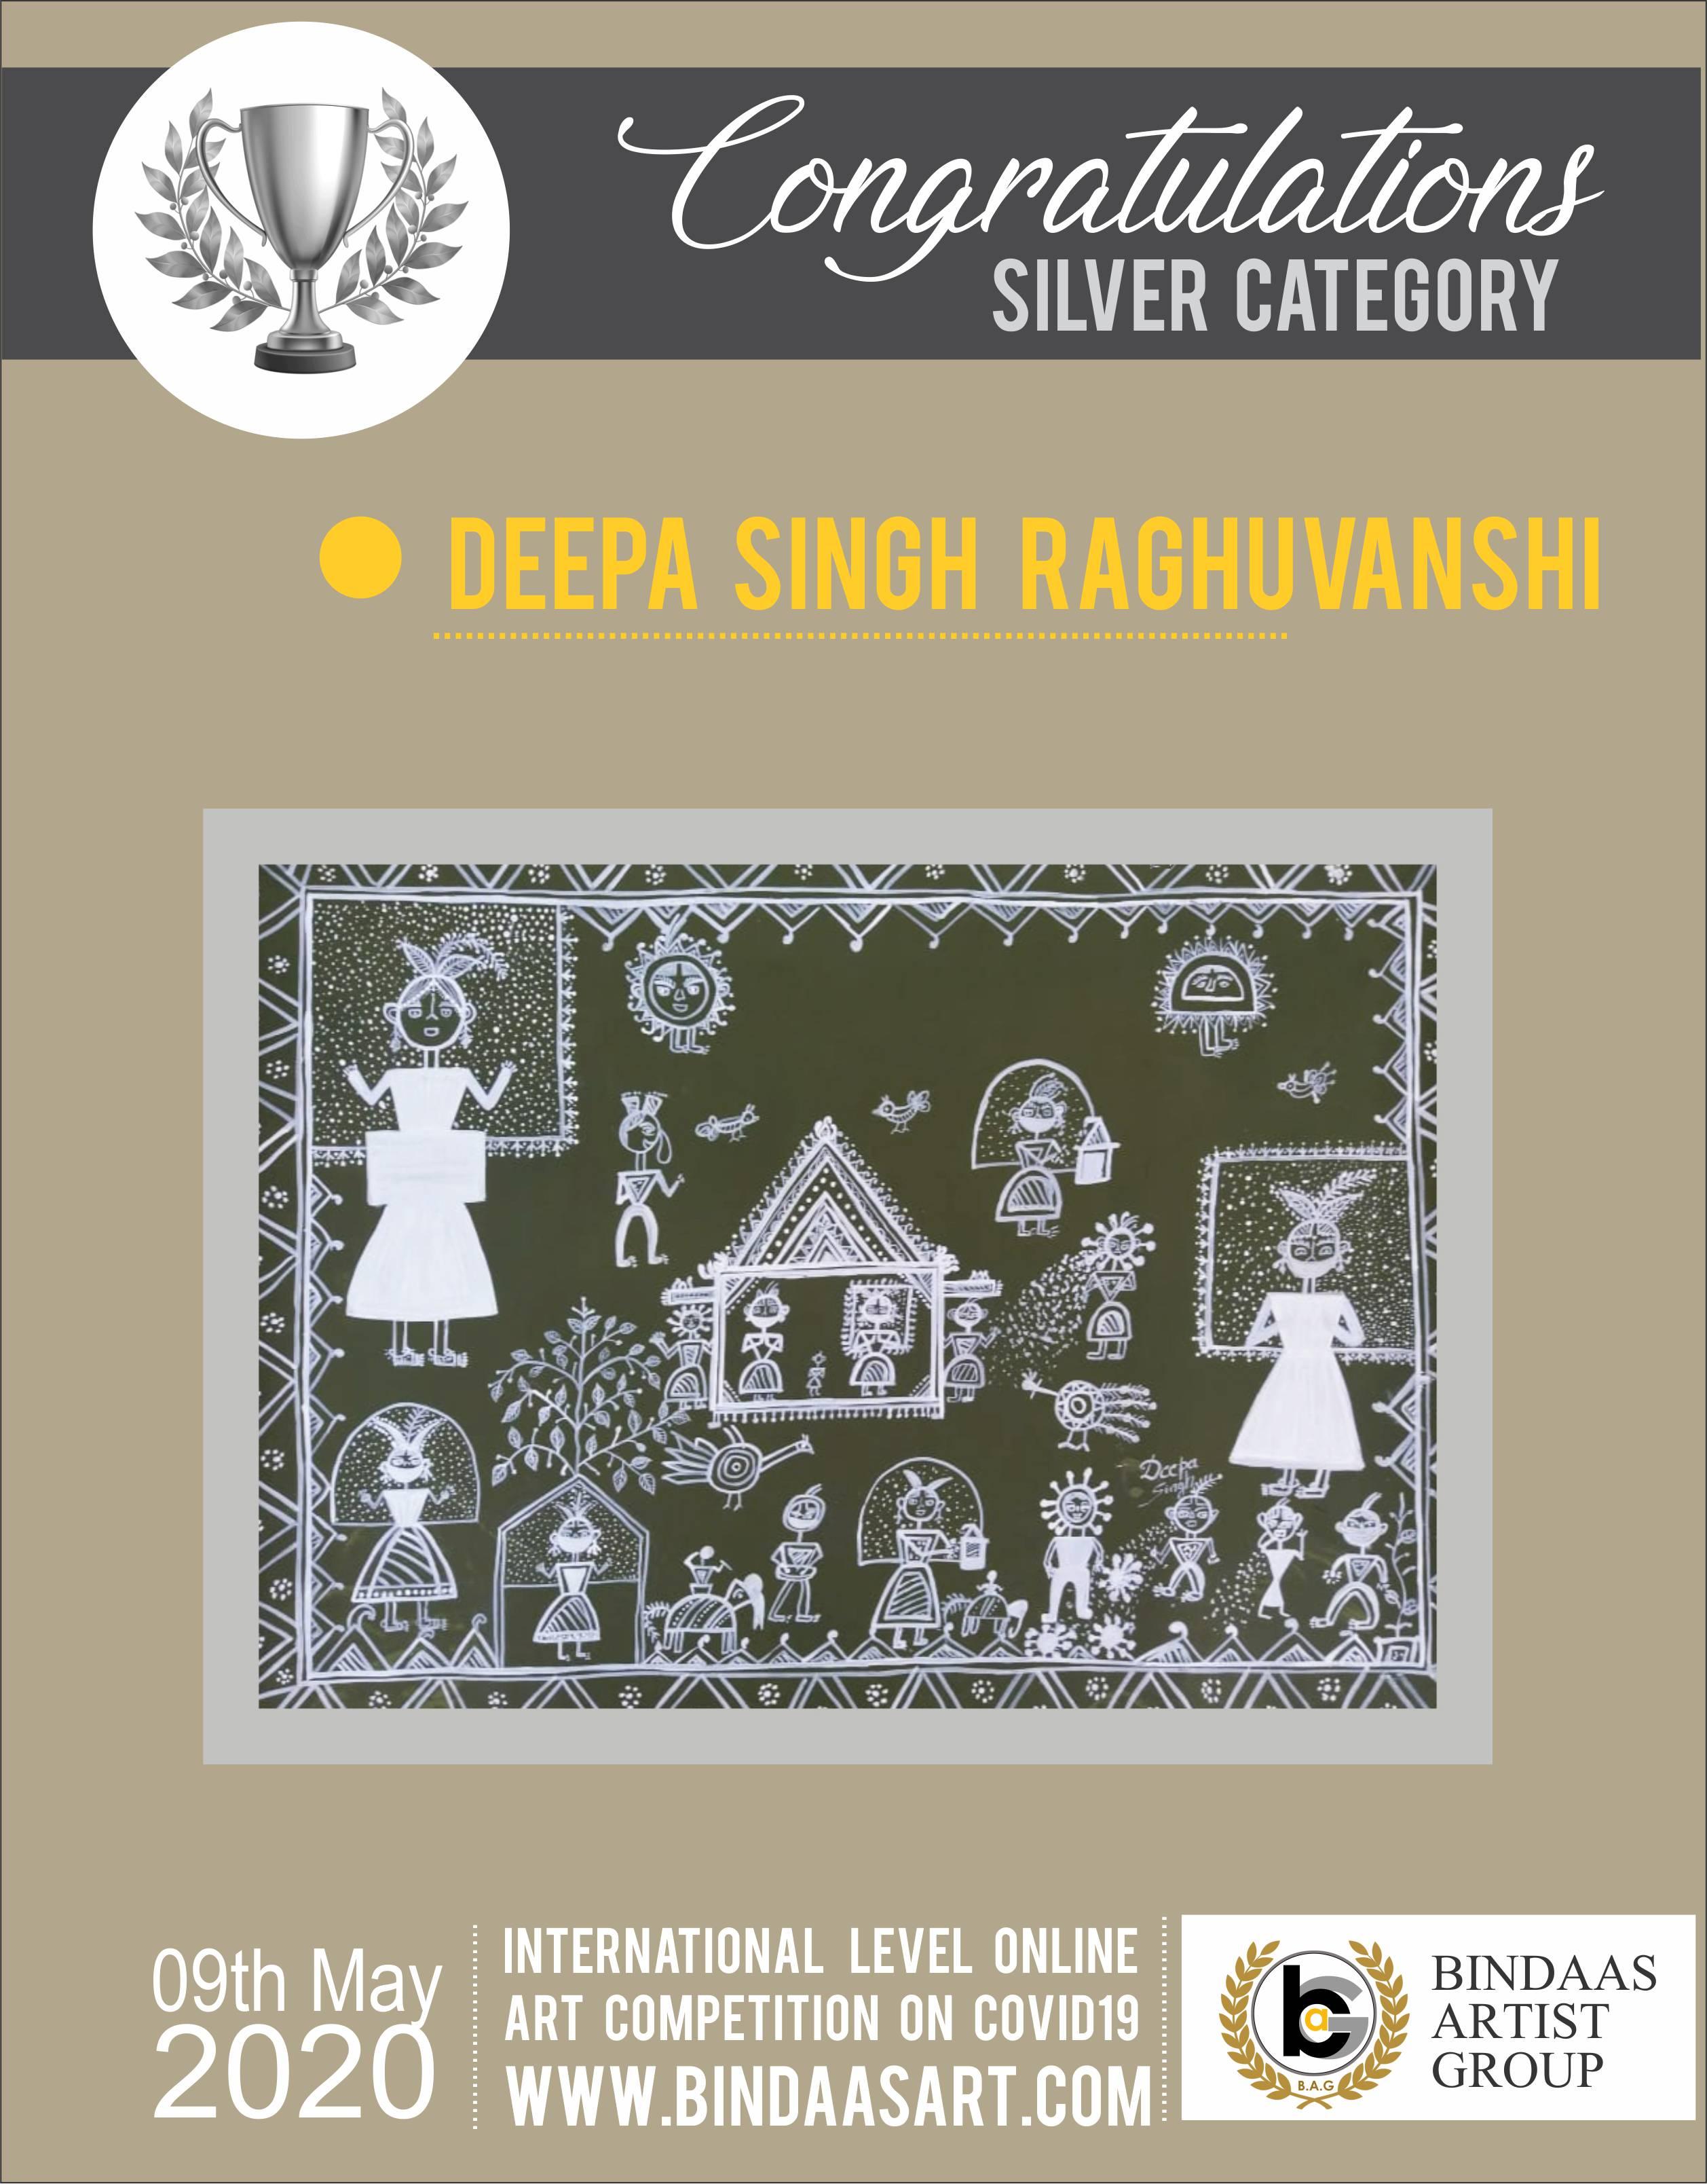 Deepa Singh Raghuvanshi